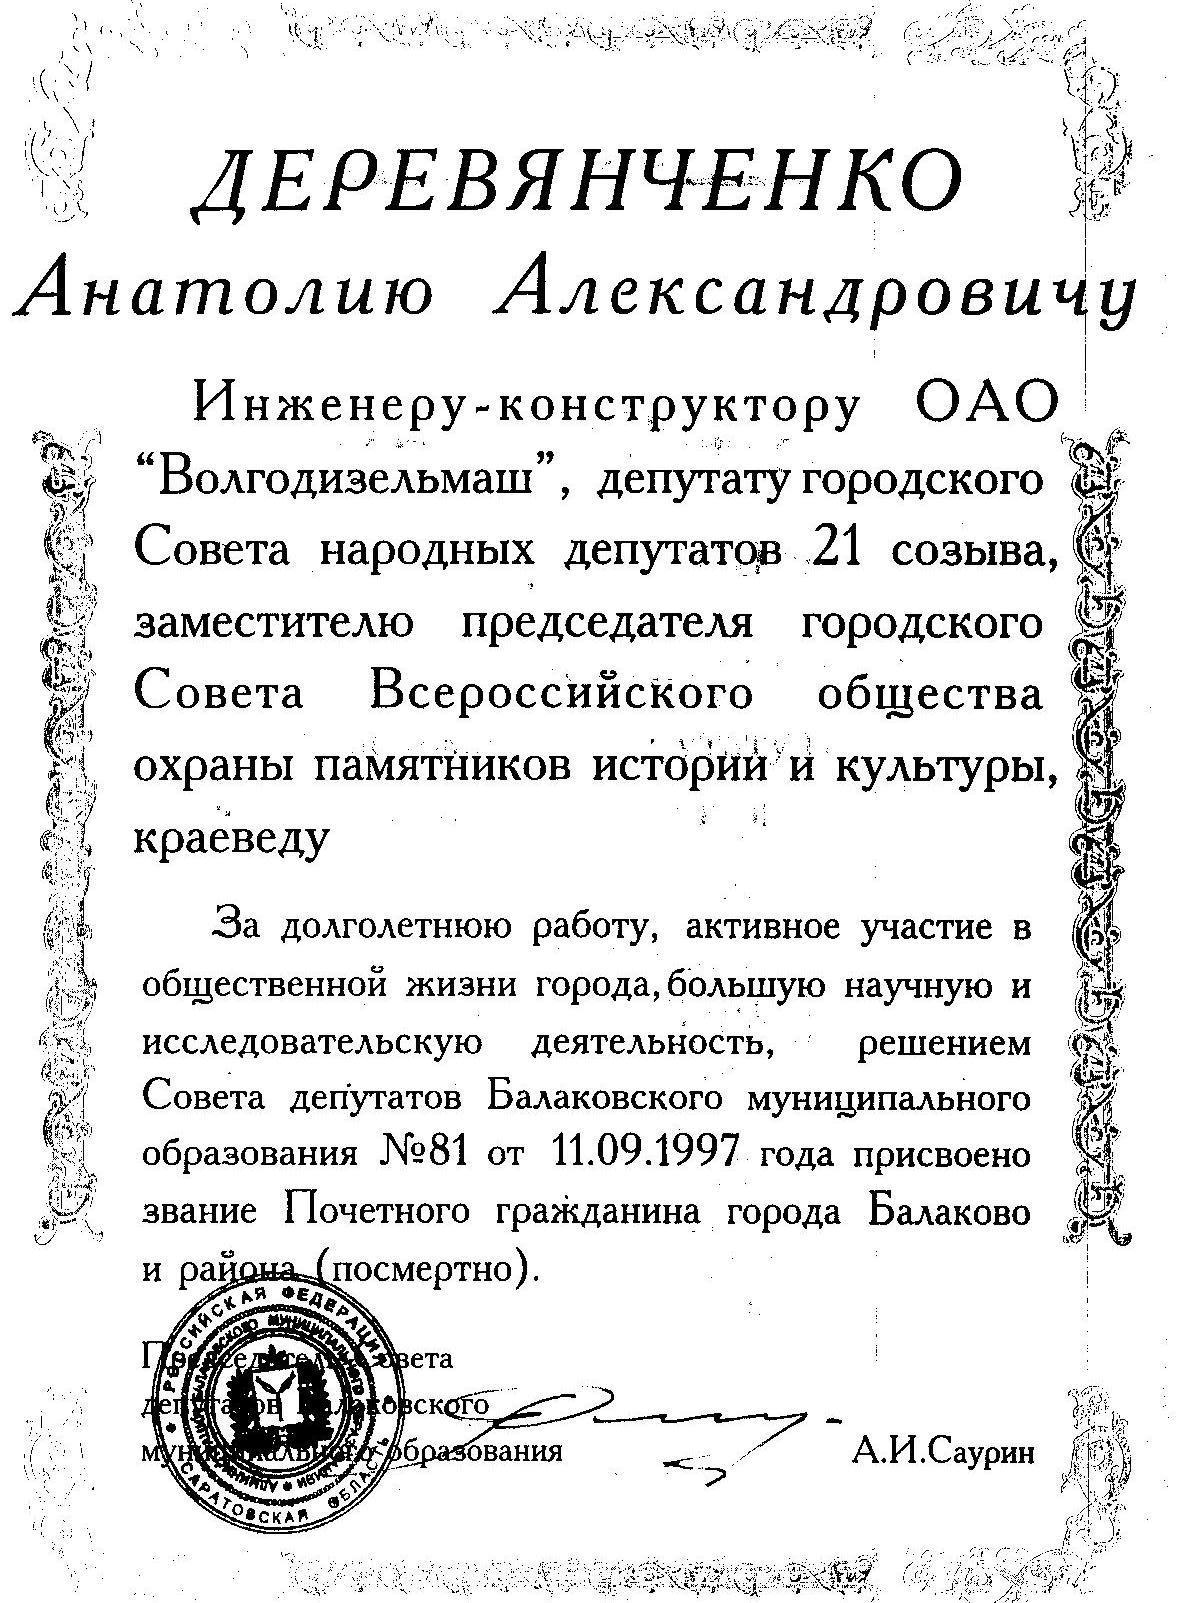 C:\Documents and Settings\USER2\Рабочий стол\Деревянченко Копии\Изображение 005.jpg